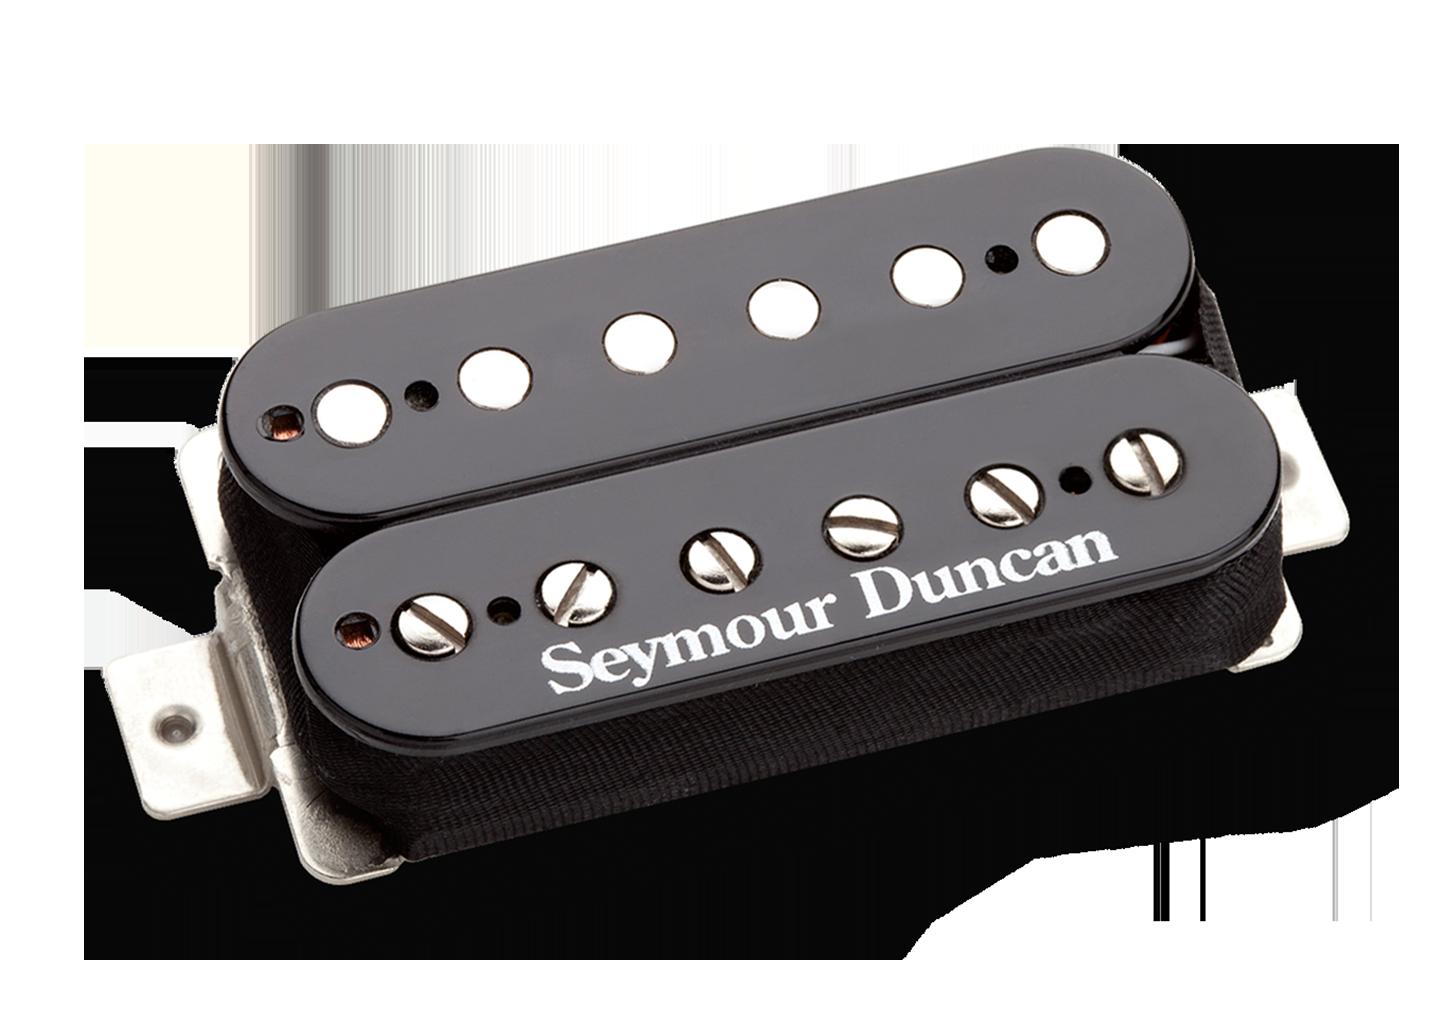 Seymour Duncan Whole Lotta Humbucker (SH-18)